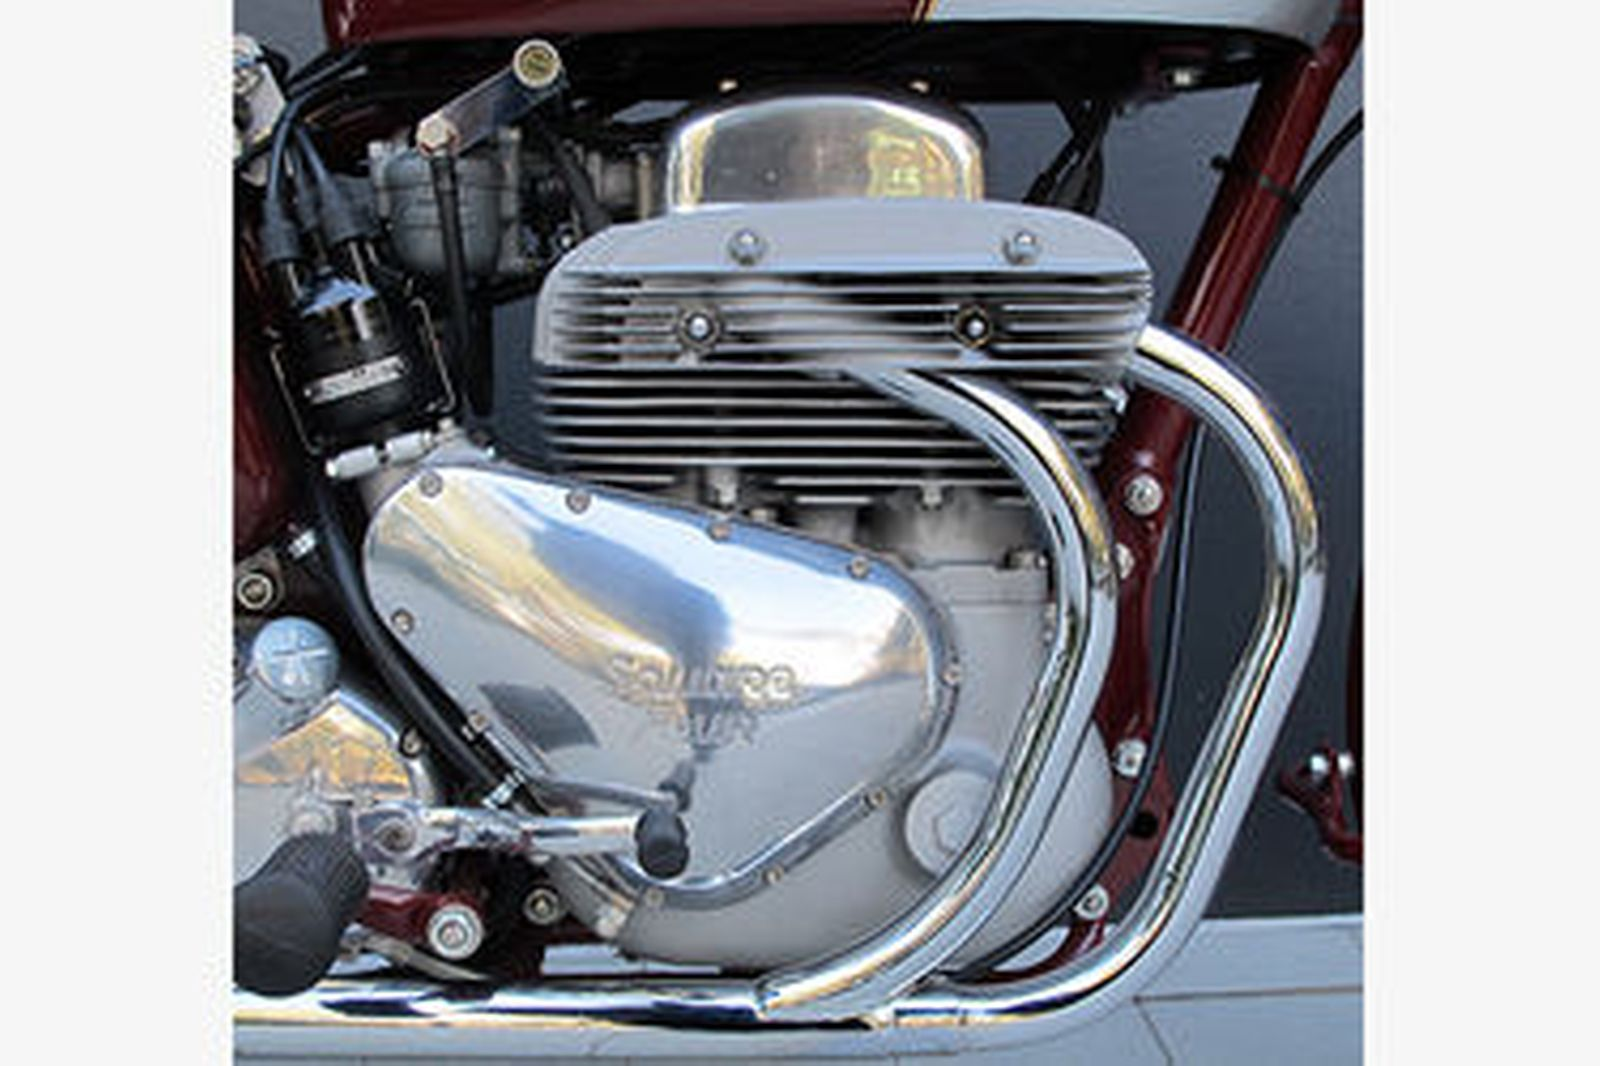 Online Car Auction >> Ariel Square Four Mk II 1000cc Motorcycle Auctions - Lot Z - Shannons